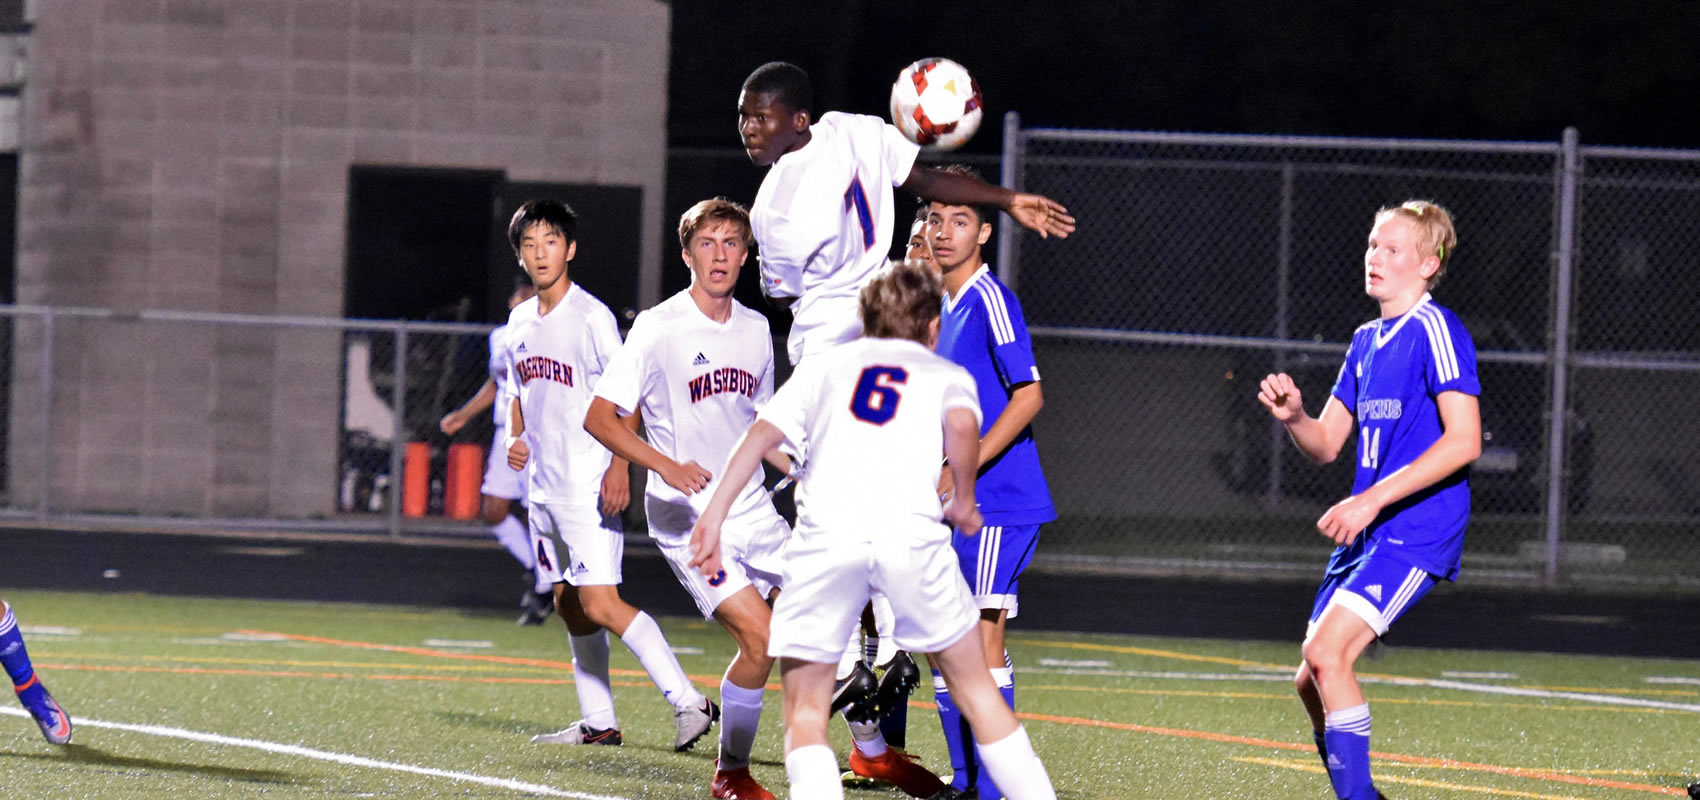 Action in Washburn soccer